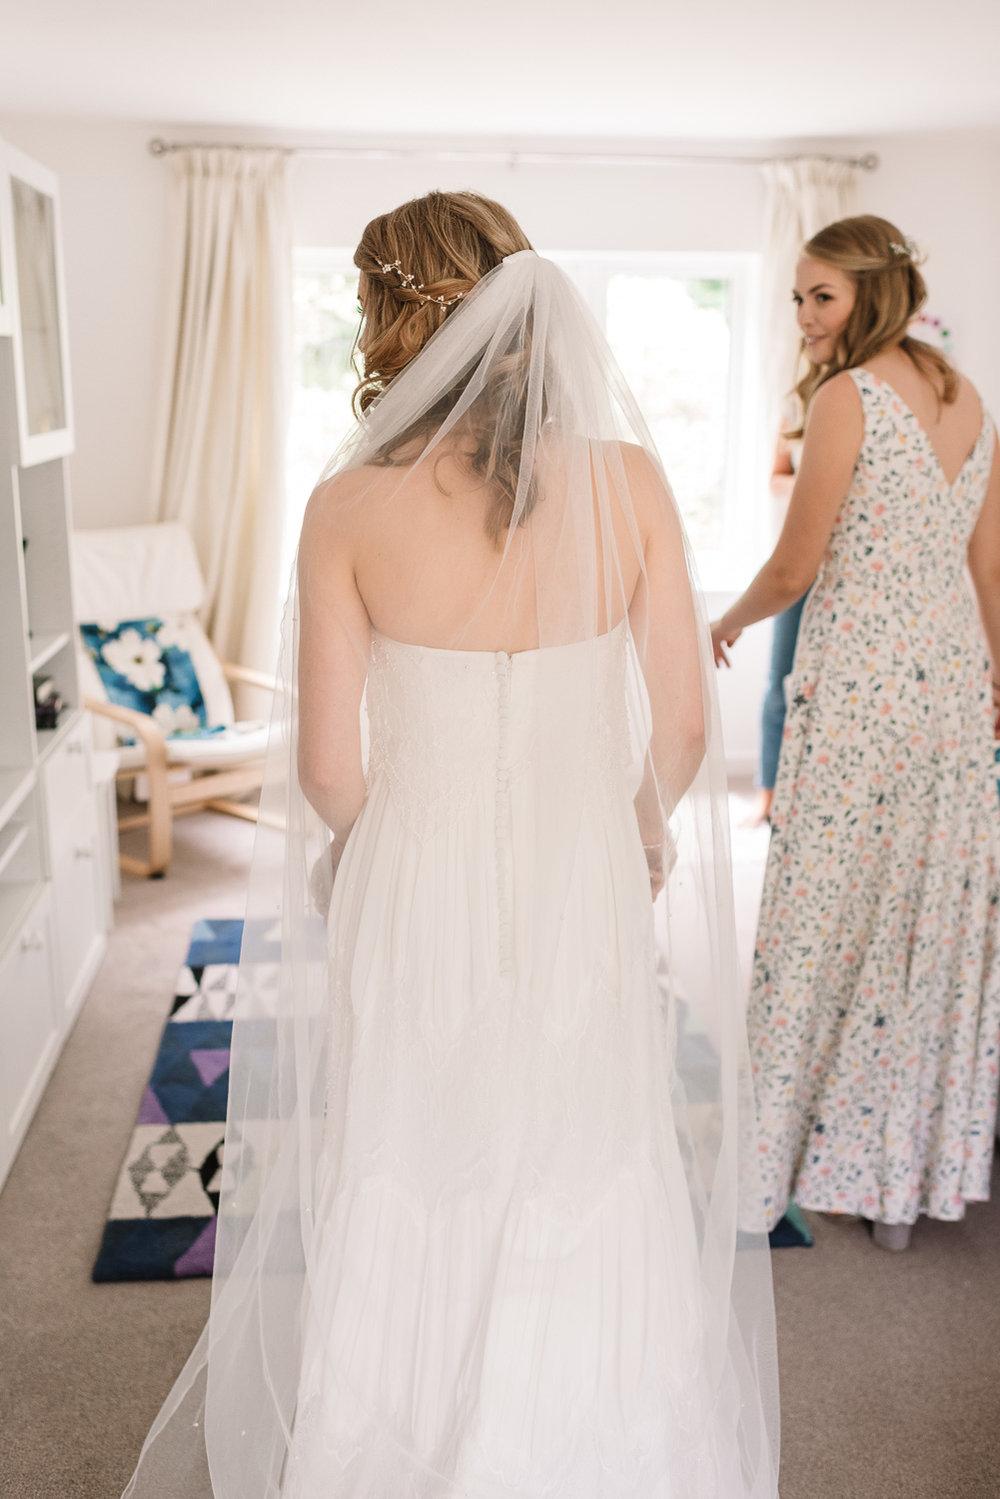 guildford-wedding-photographer-5.jpg